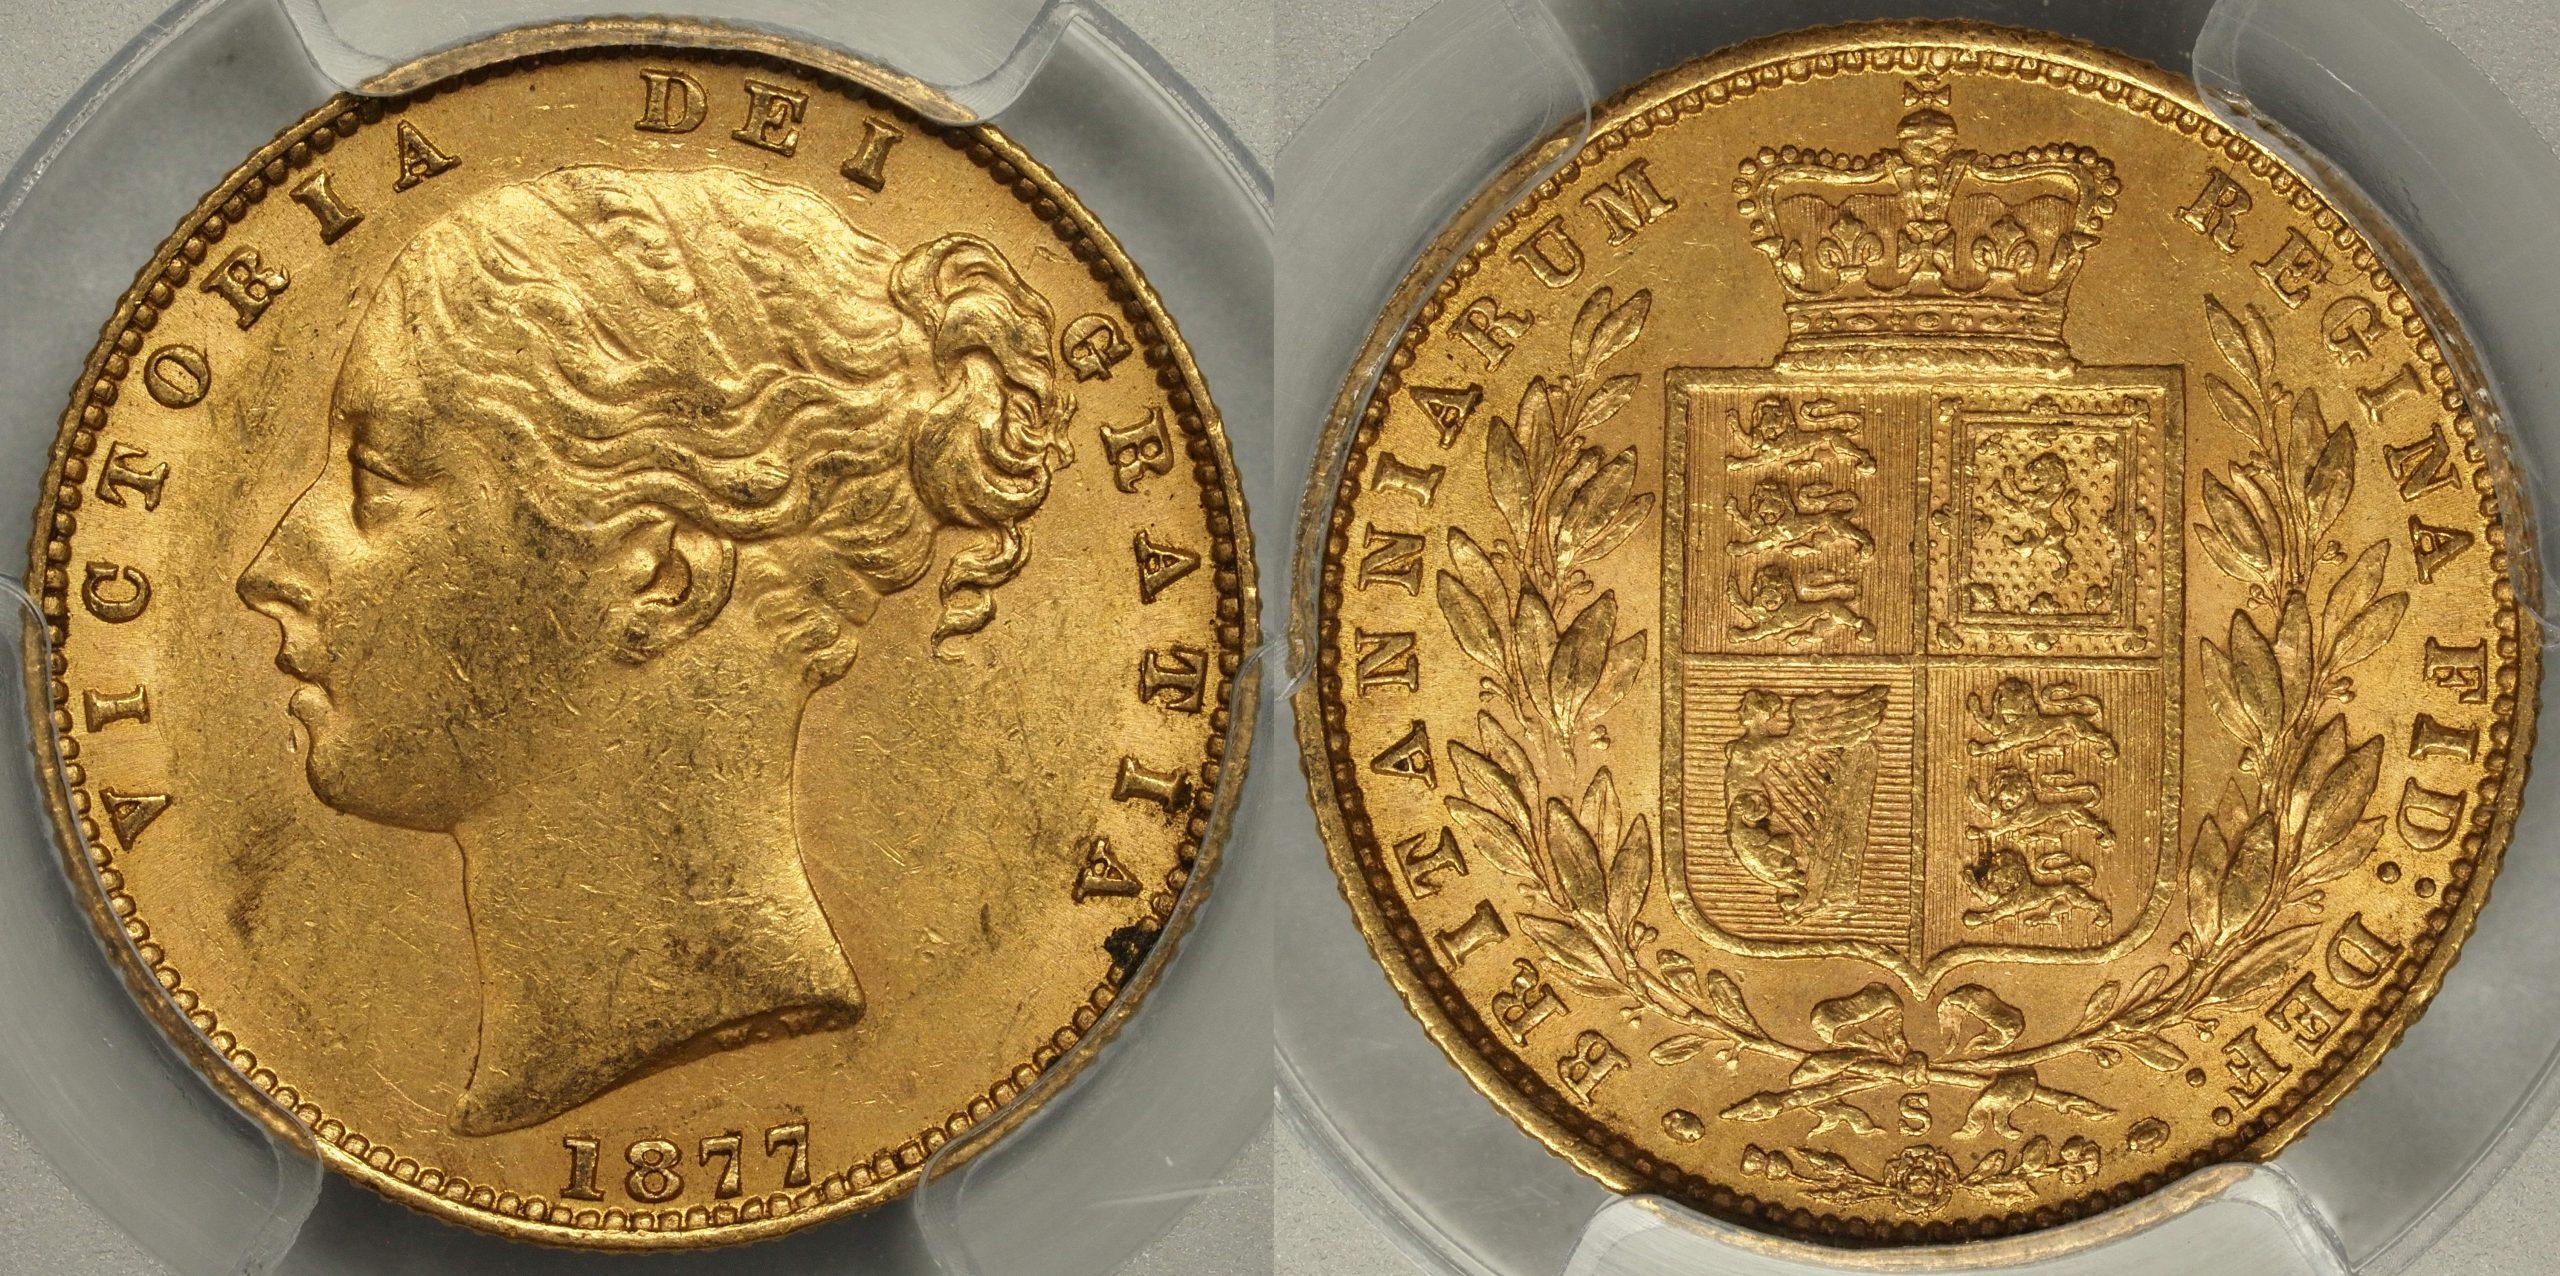 Australia 1877 Sydney Sovereign - PCGS AU58